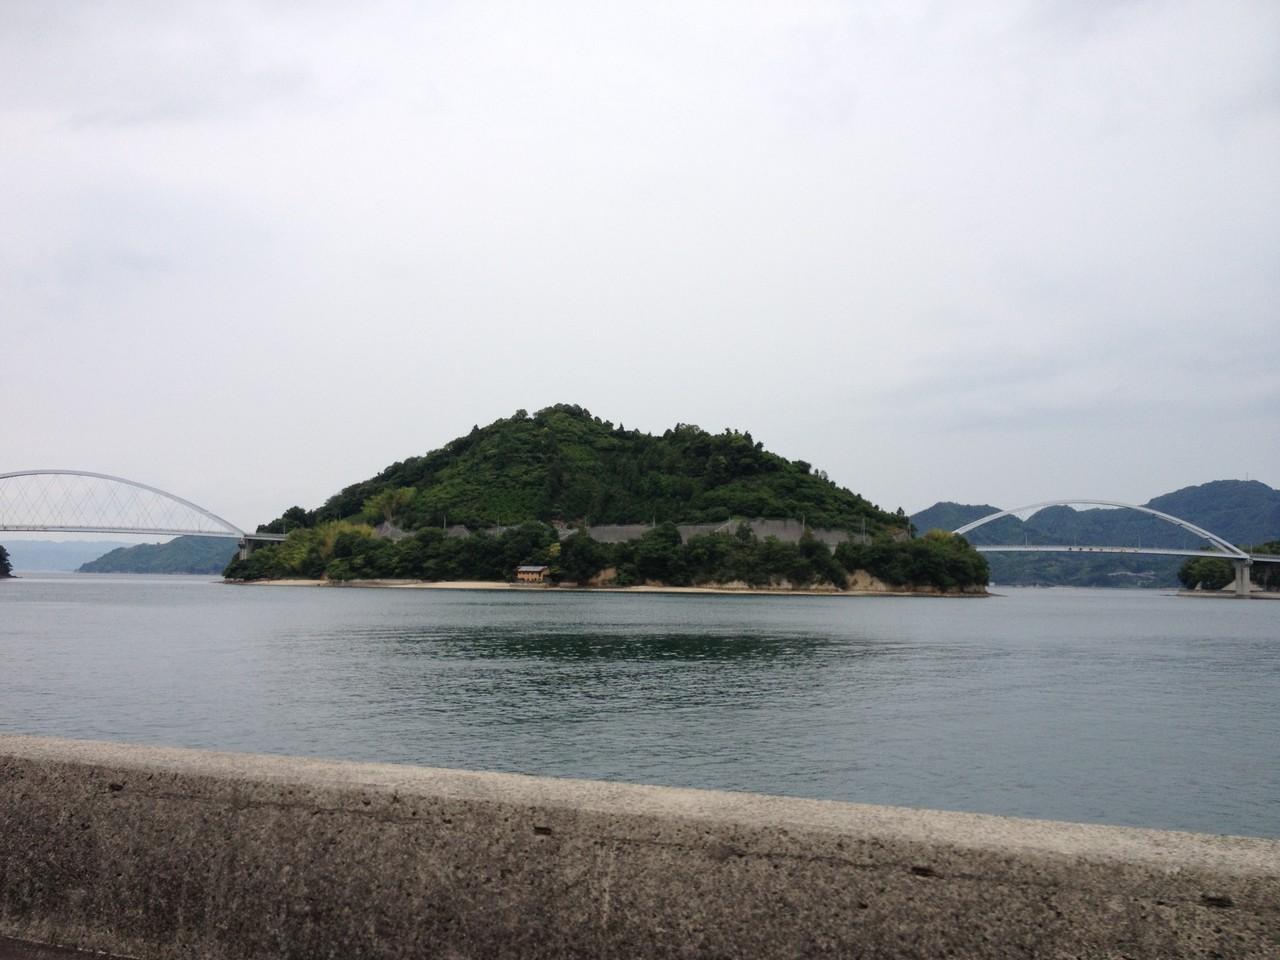 中の瀬戸大橋(左)・岡村大橋(右)